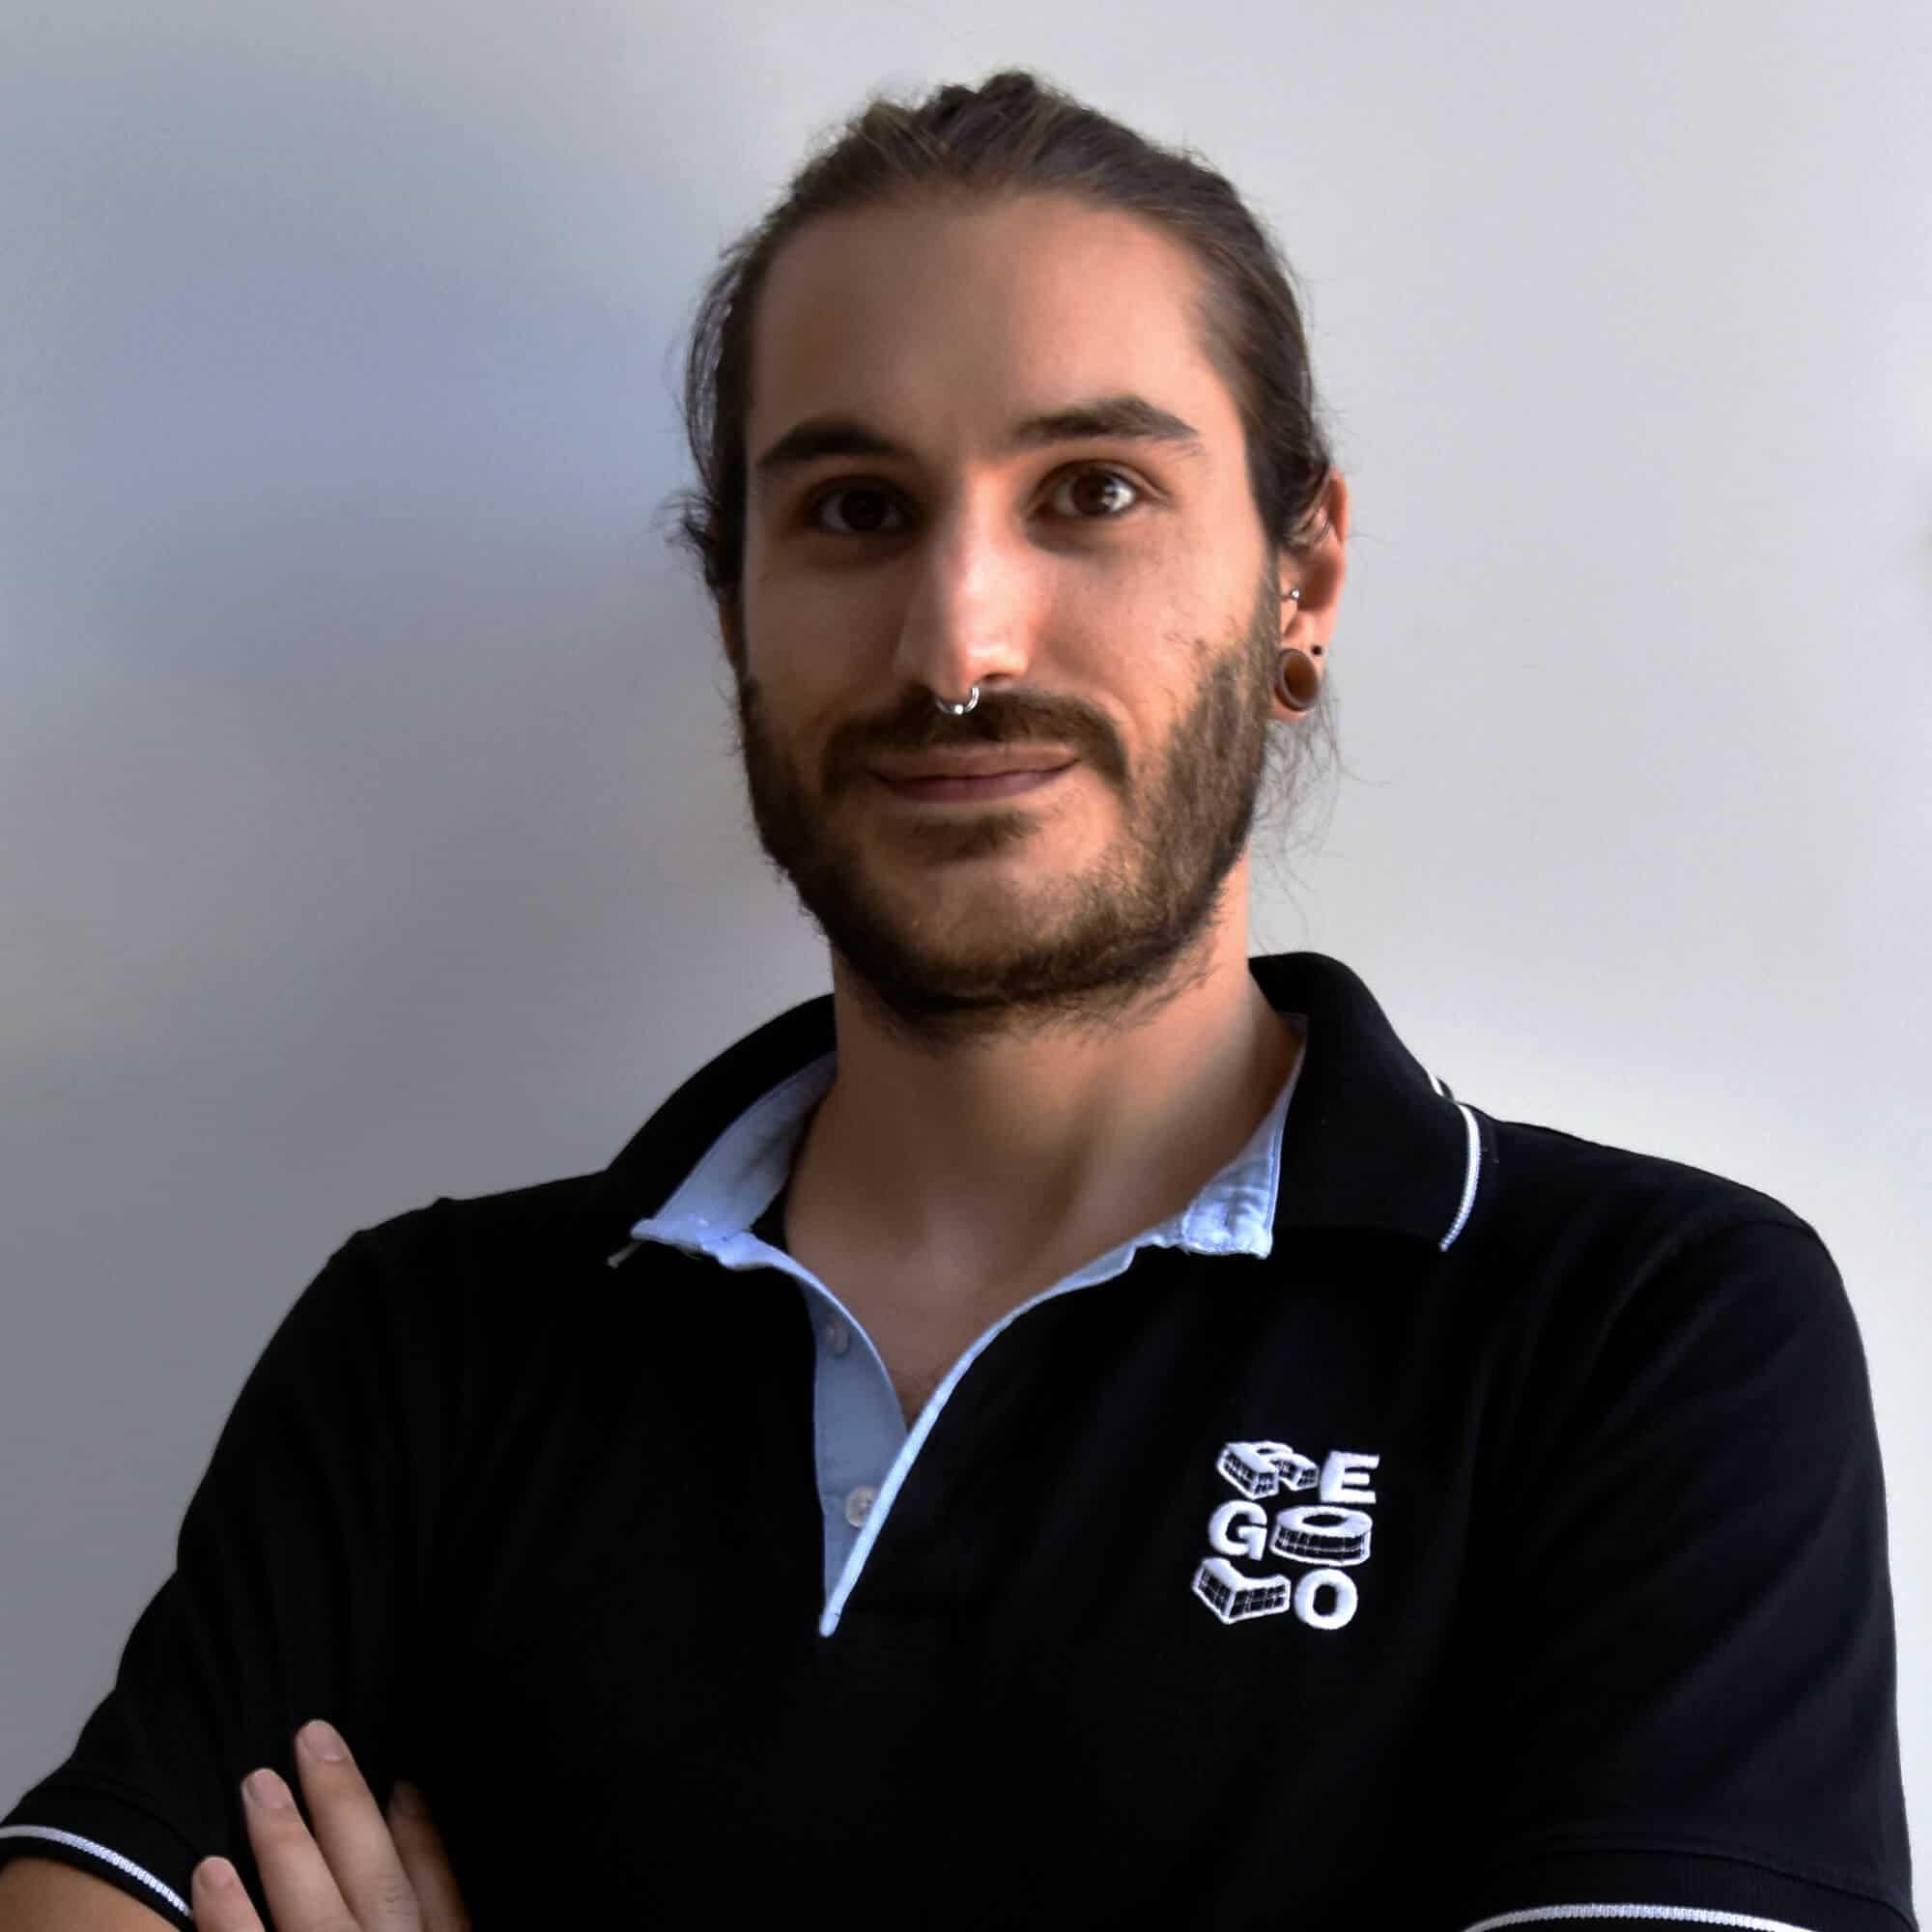 Luca Cappelli disegnatore tecnico CAD/CAM presso Regolo Studio